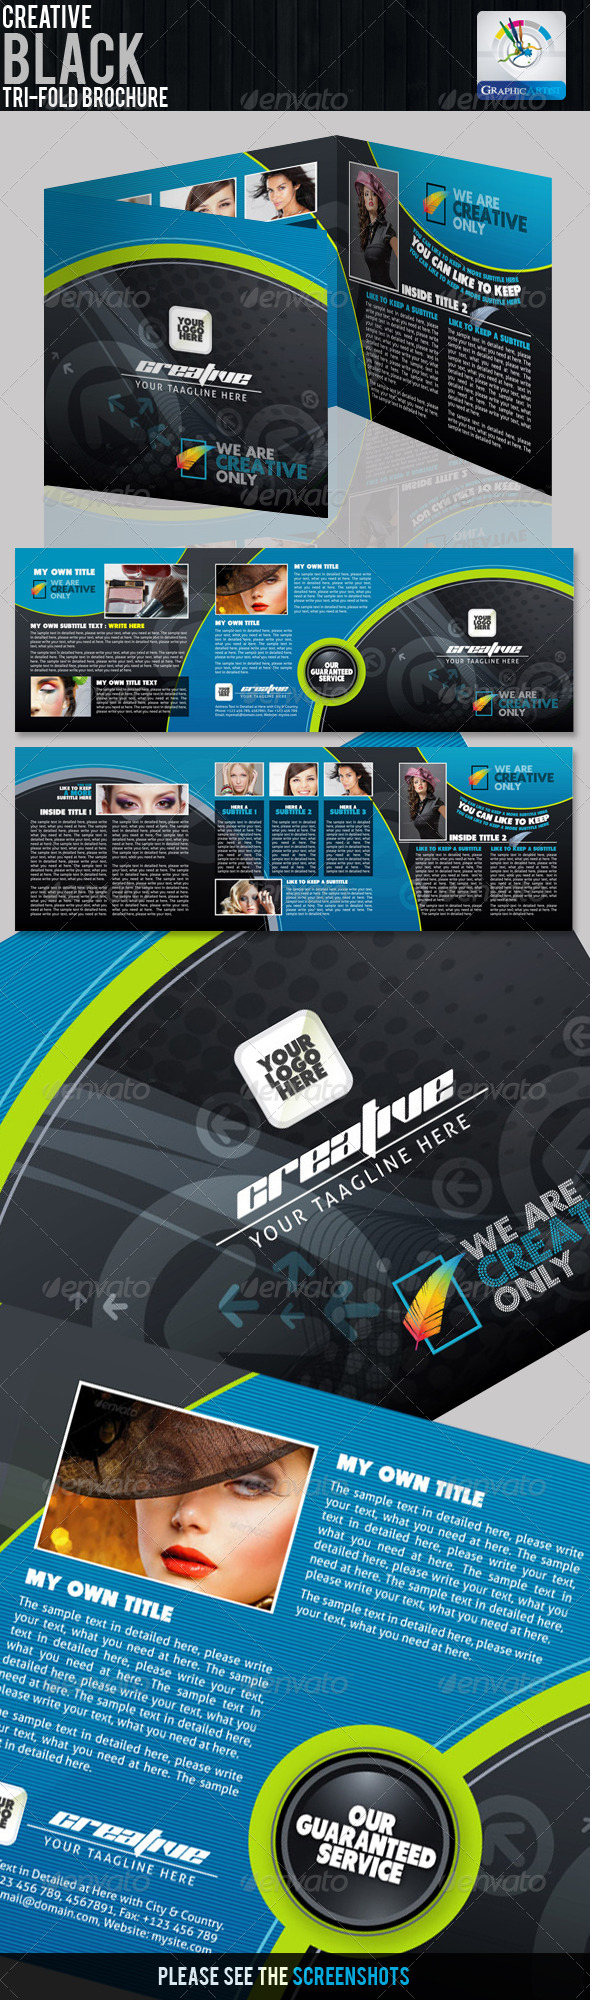 Creative Black Tri-fold Brochure - Corporate Brochures